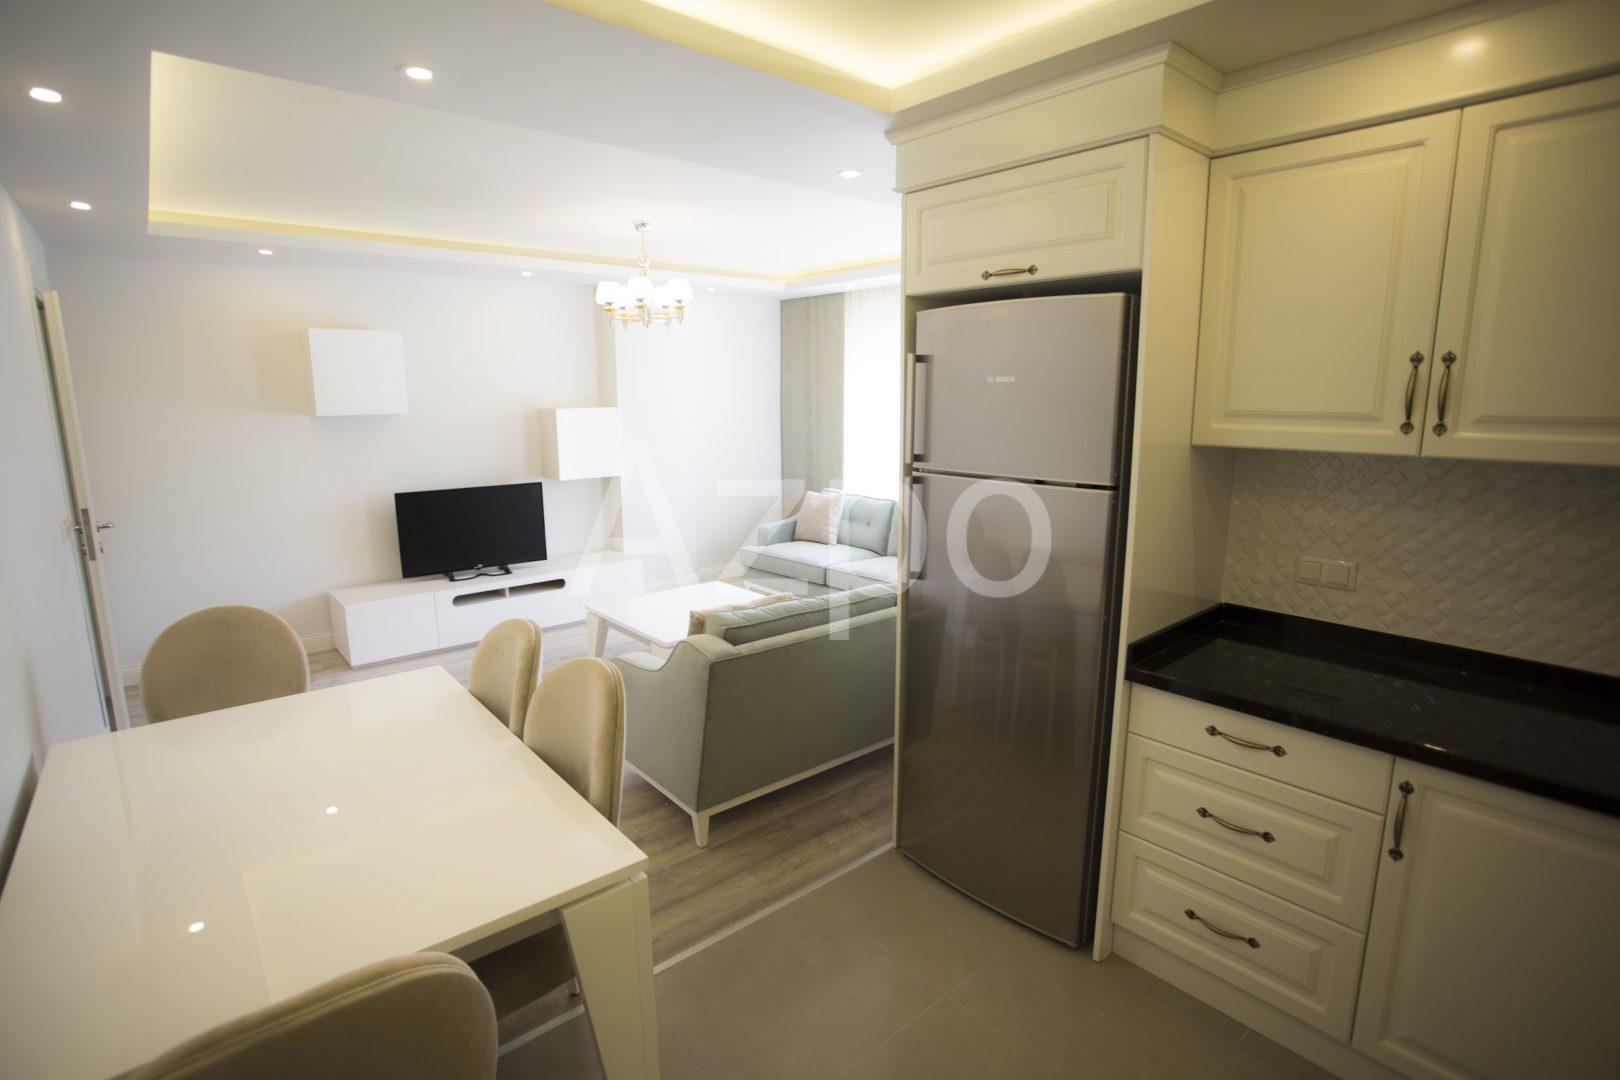 Квартиры 1+1 и 2+1 в комплексе в районе Хурма Коньяалты Анталия - Фото 20